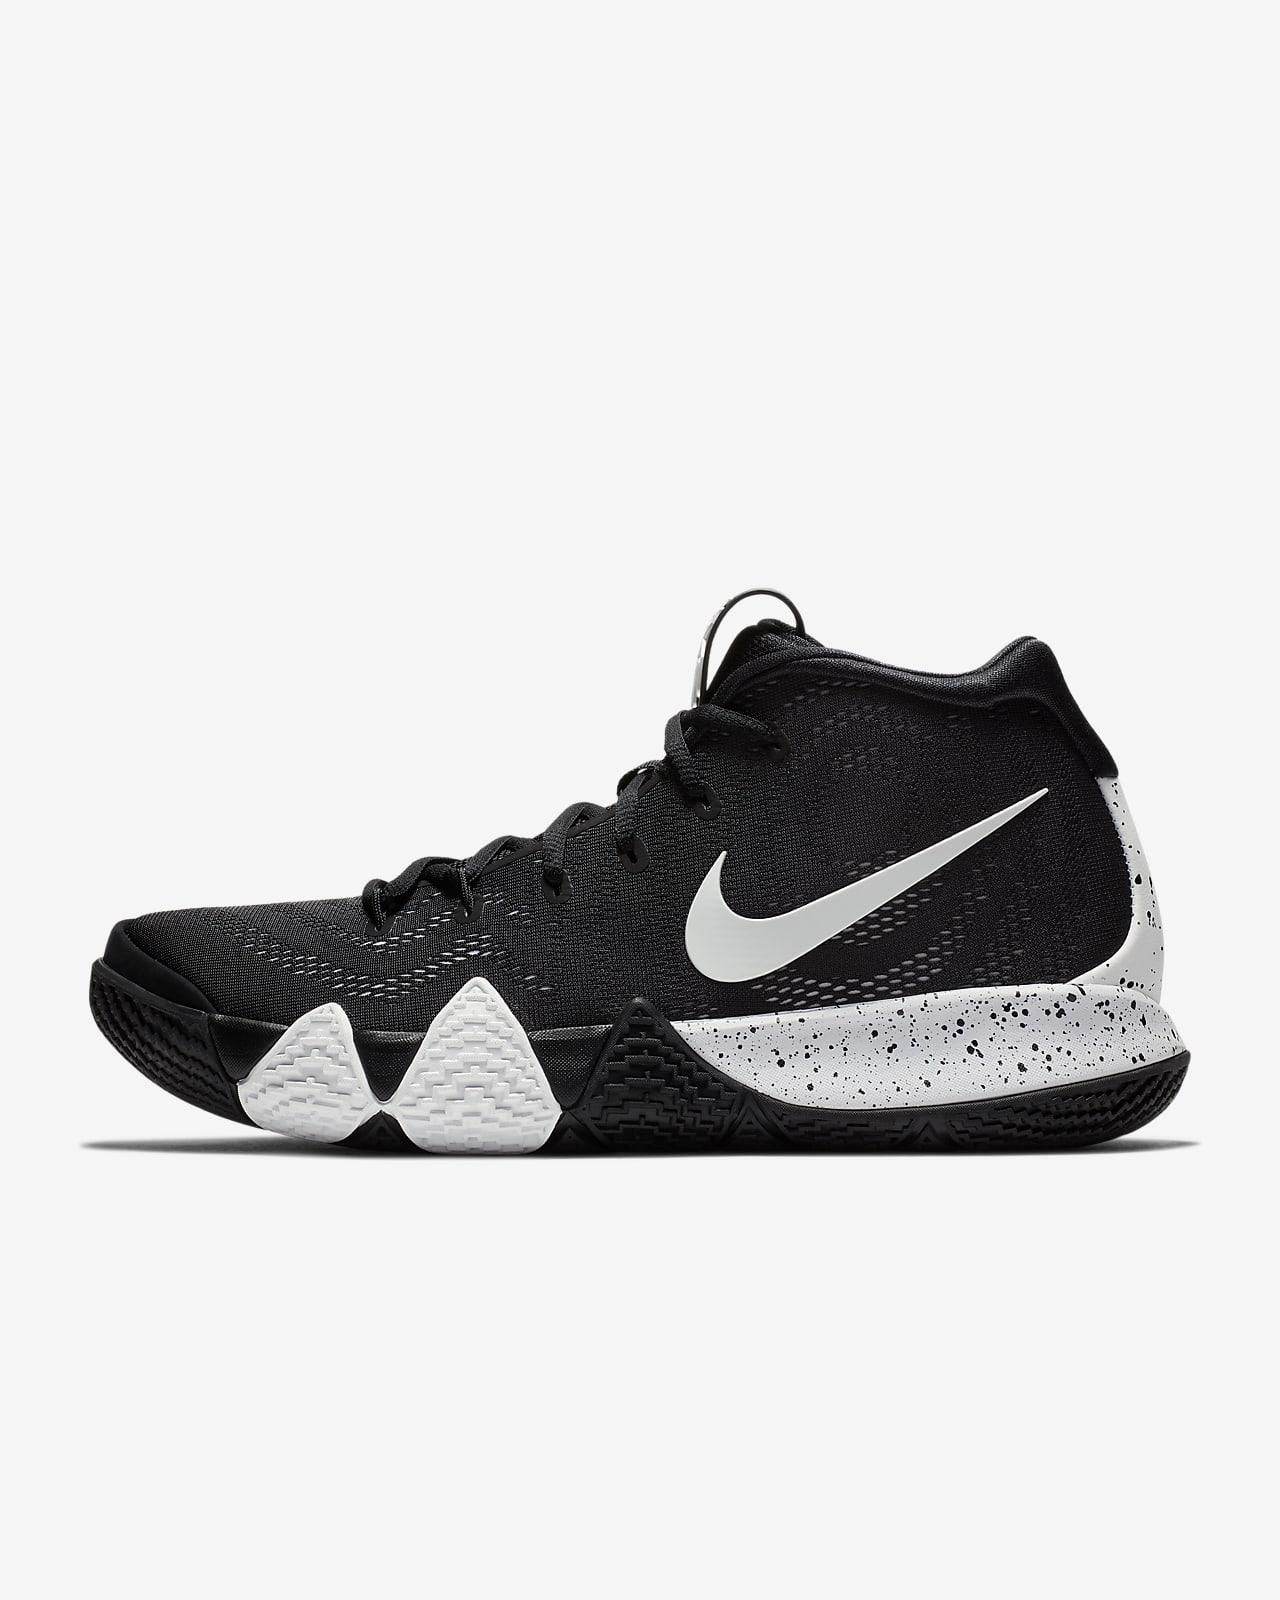 Kyrie 4 (Team) Basketball Shoe. Nike SG